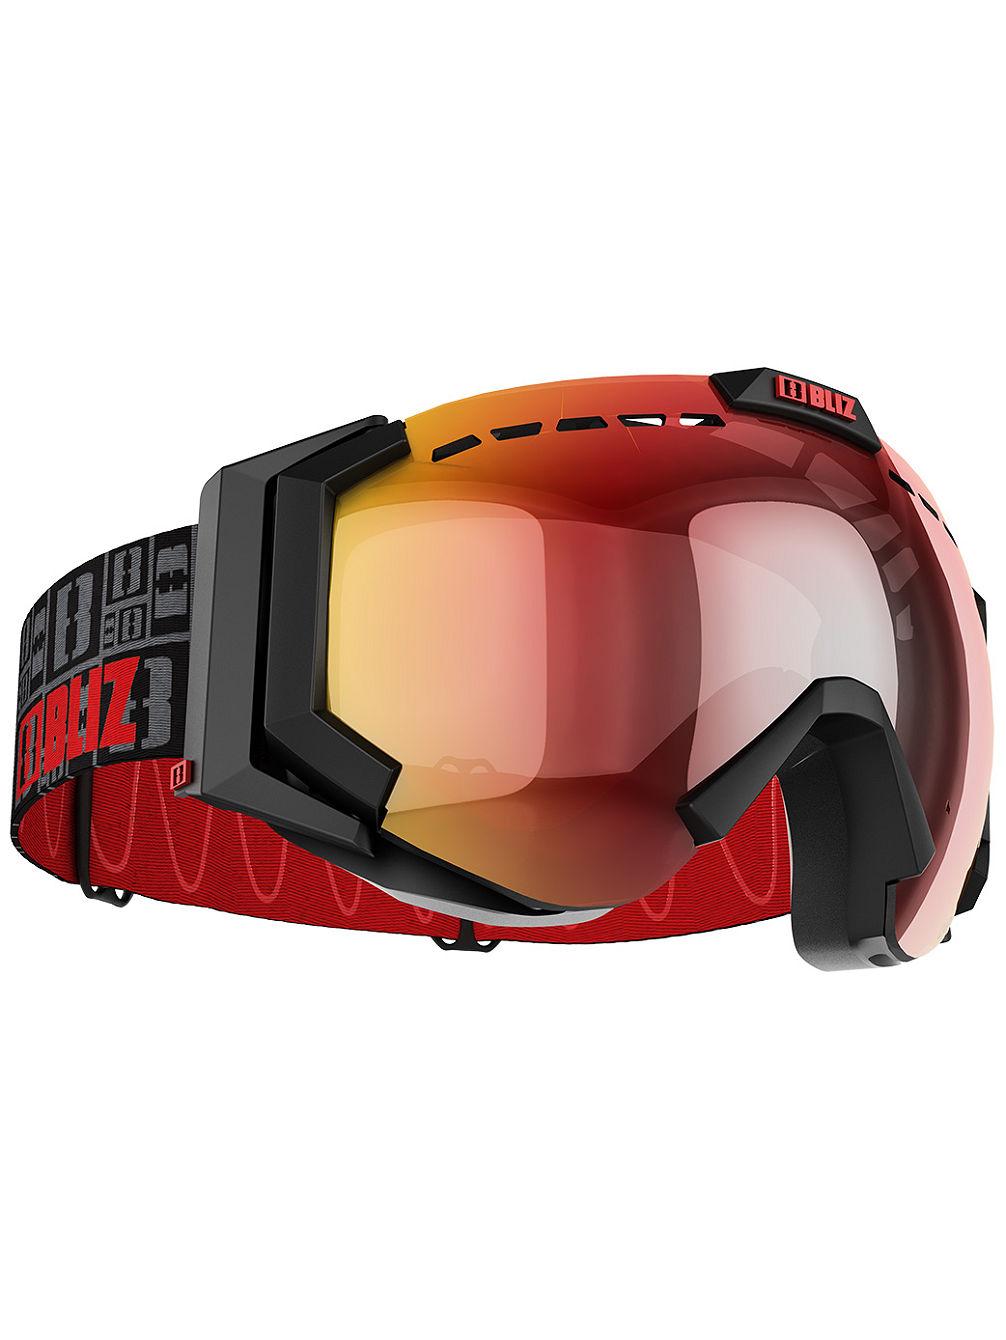 bliz-protective-sports-gear-carver-xt-matt-black